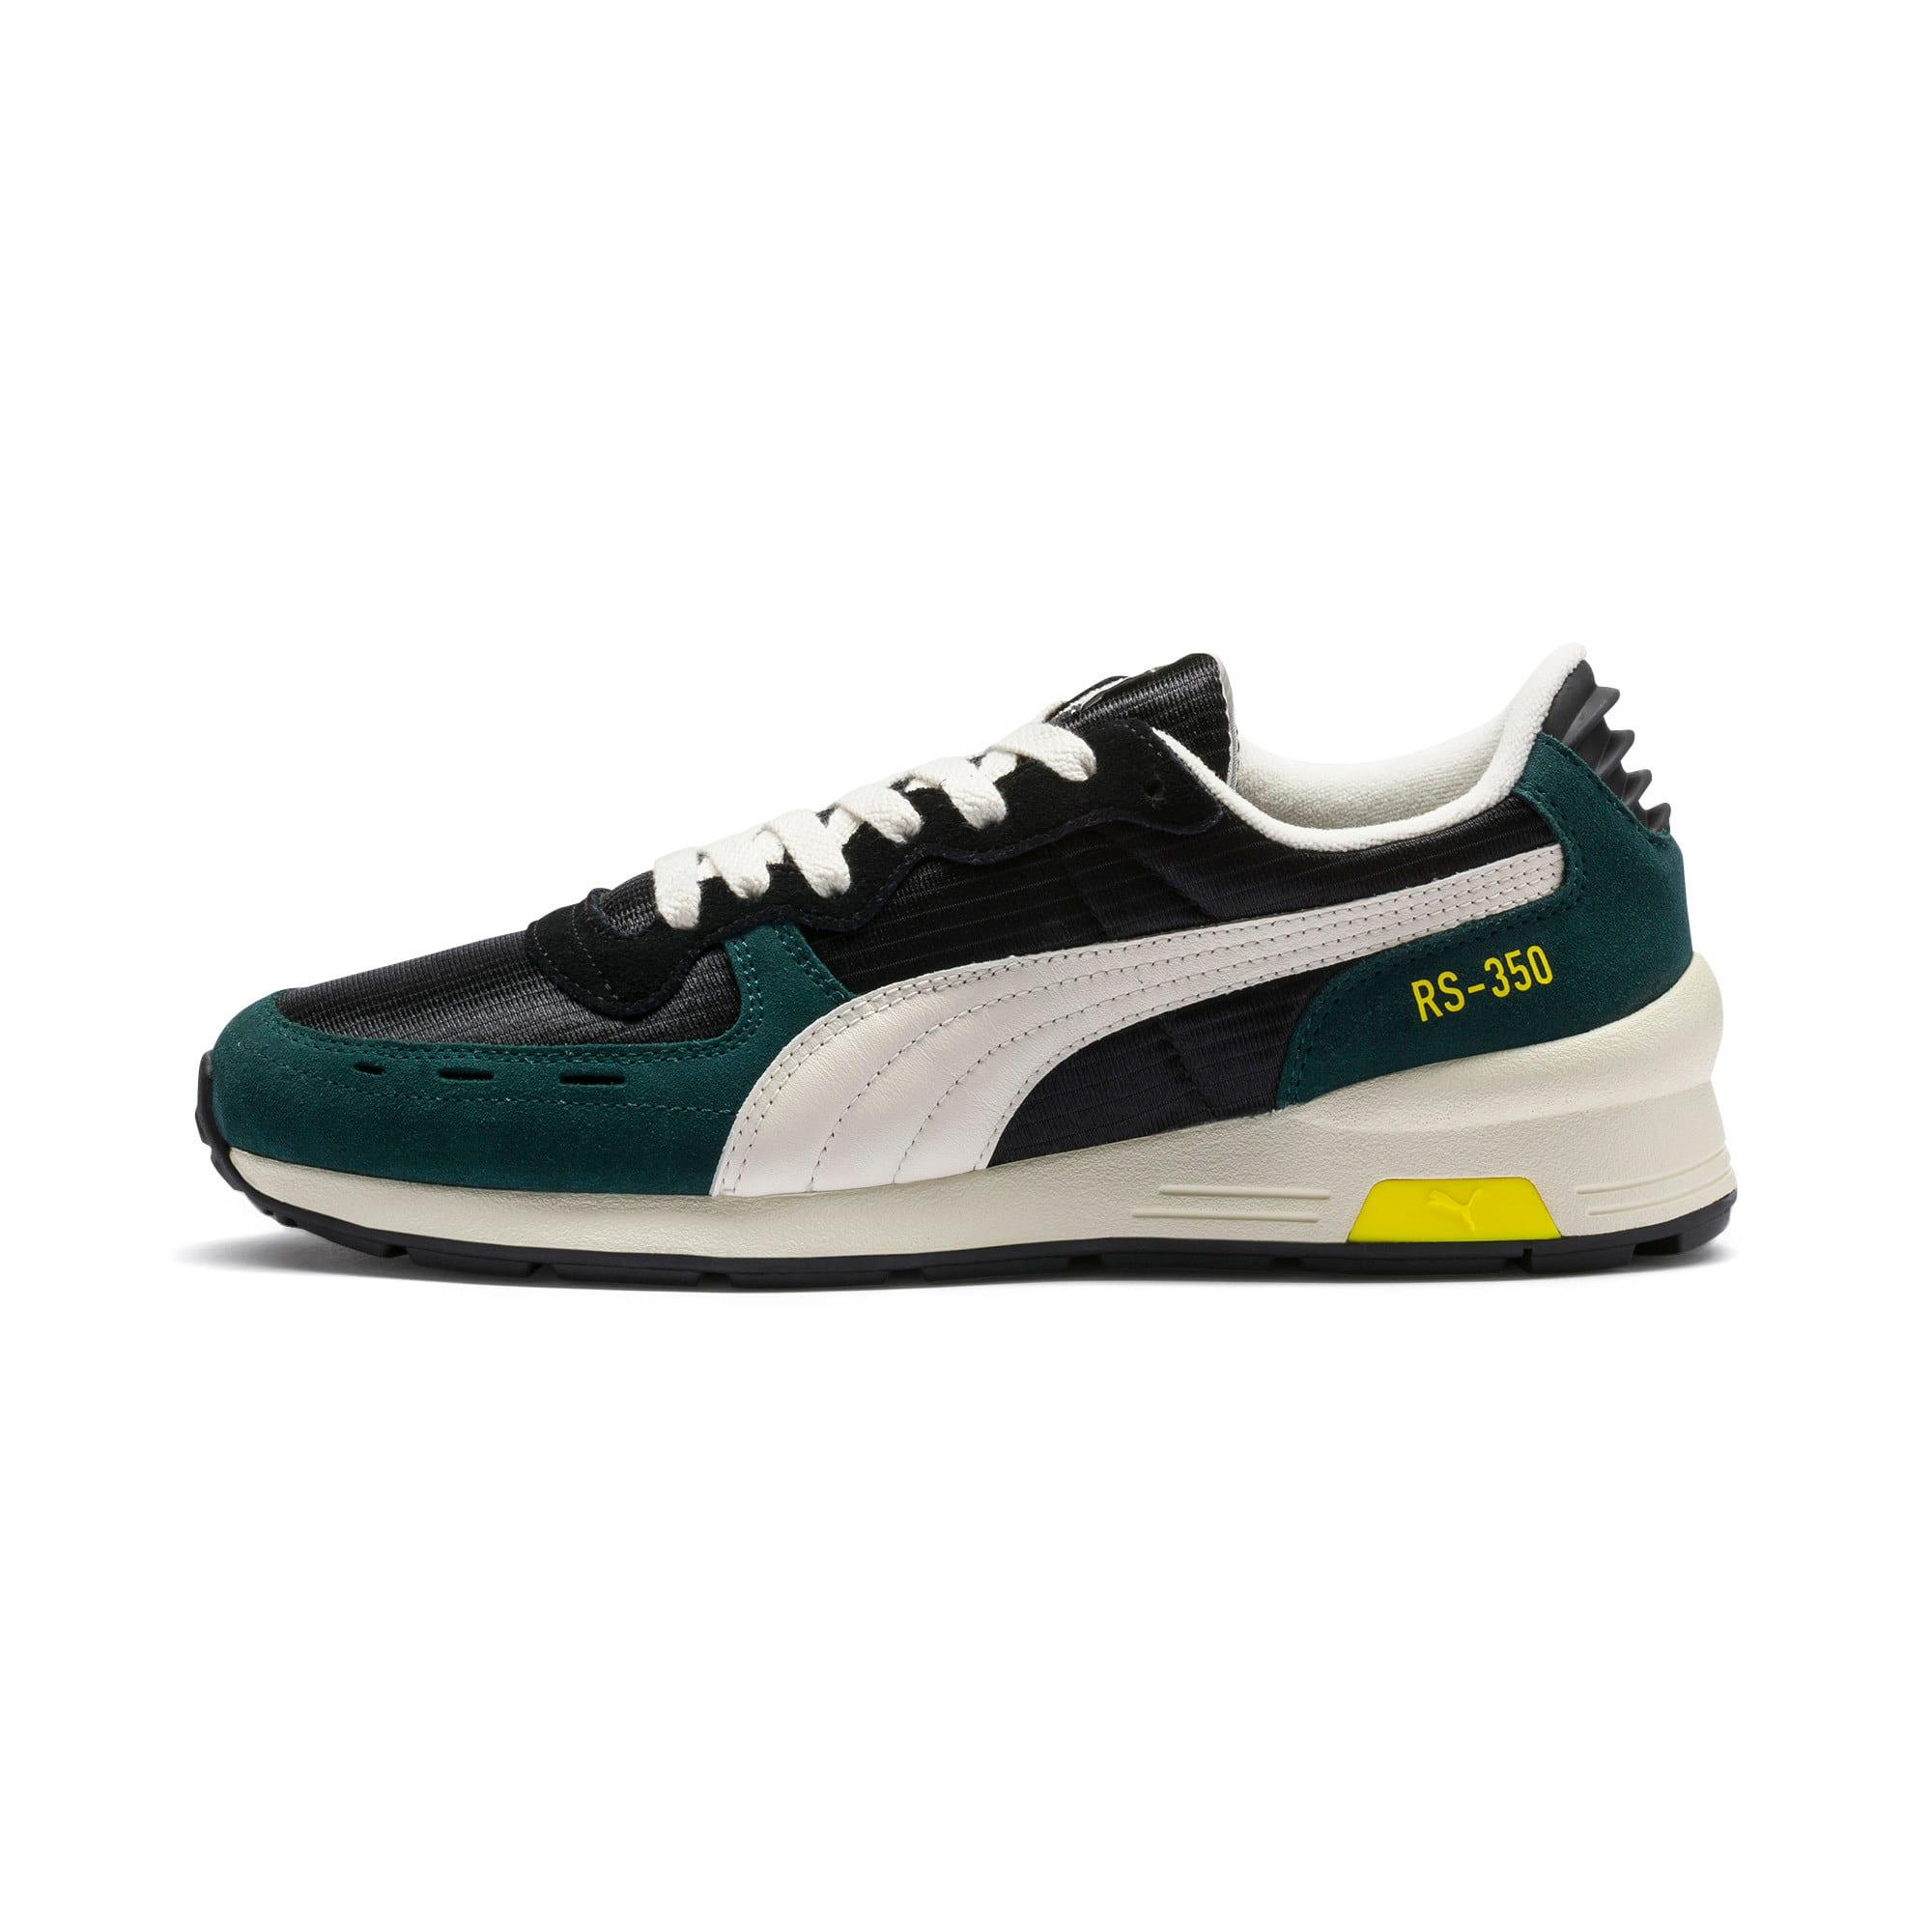 Thumbnail 1 of RS-350 OG Men's Sneakers, Puma Black-Ponderosa Pine, medium